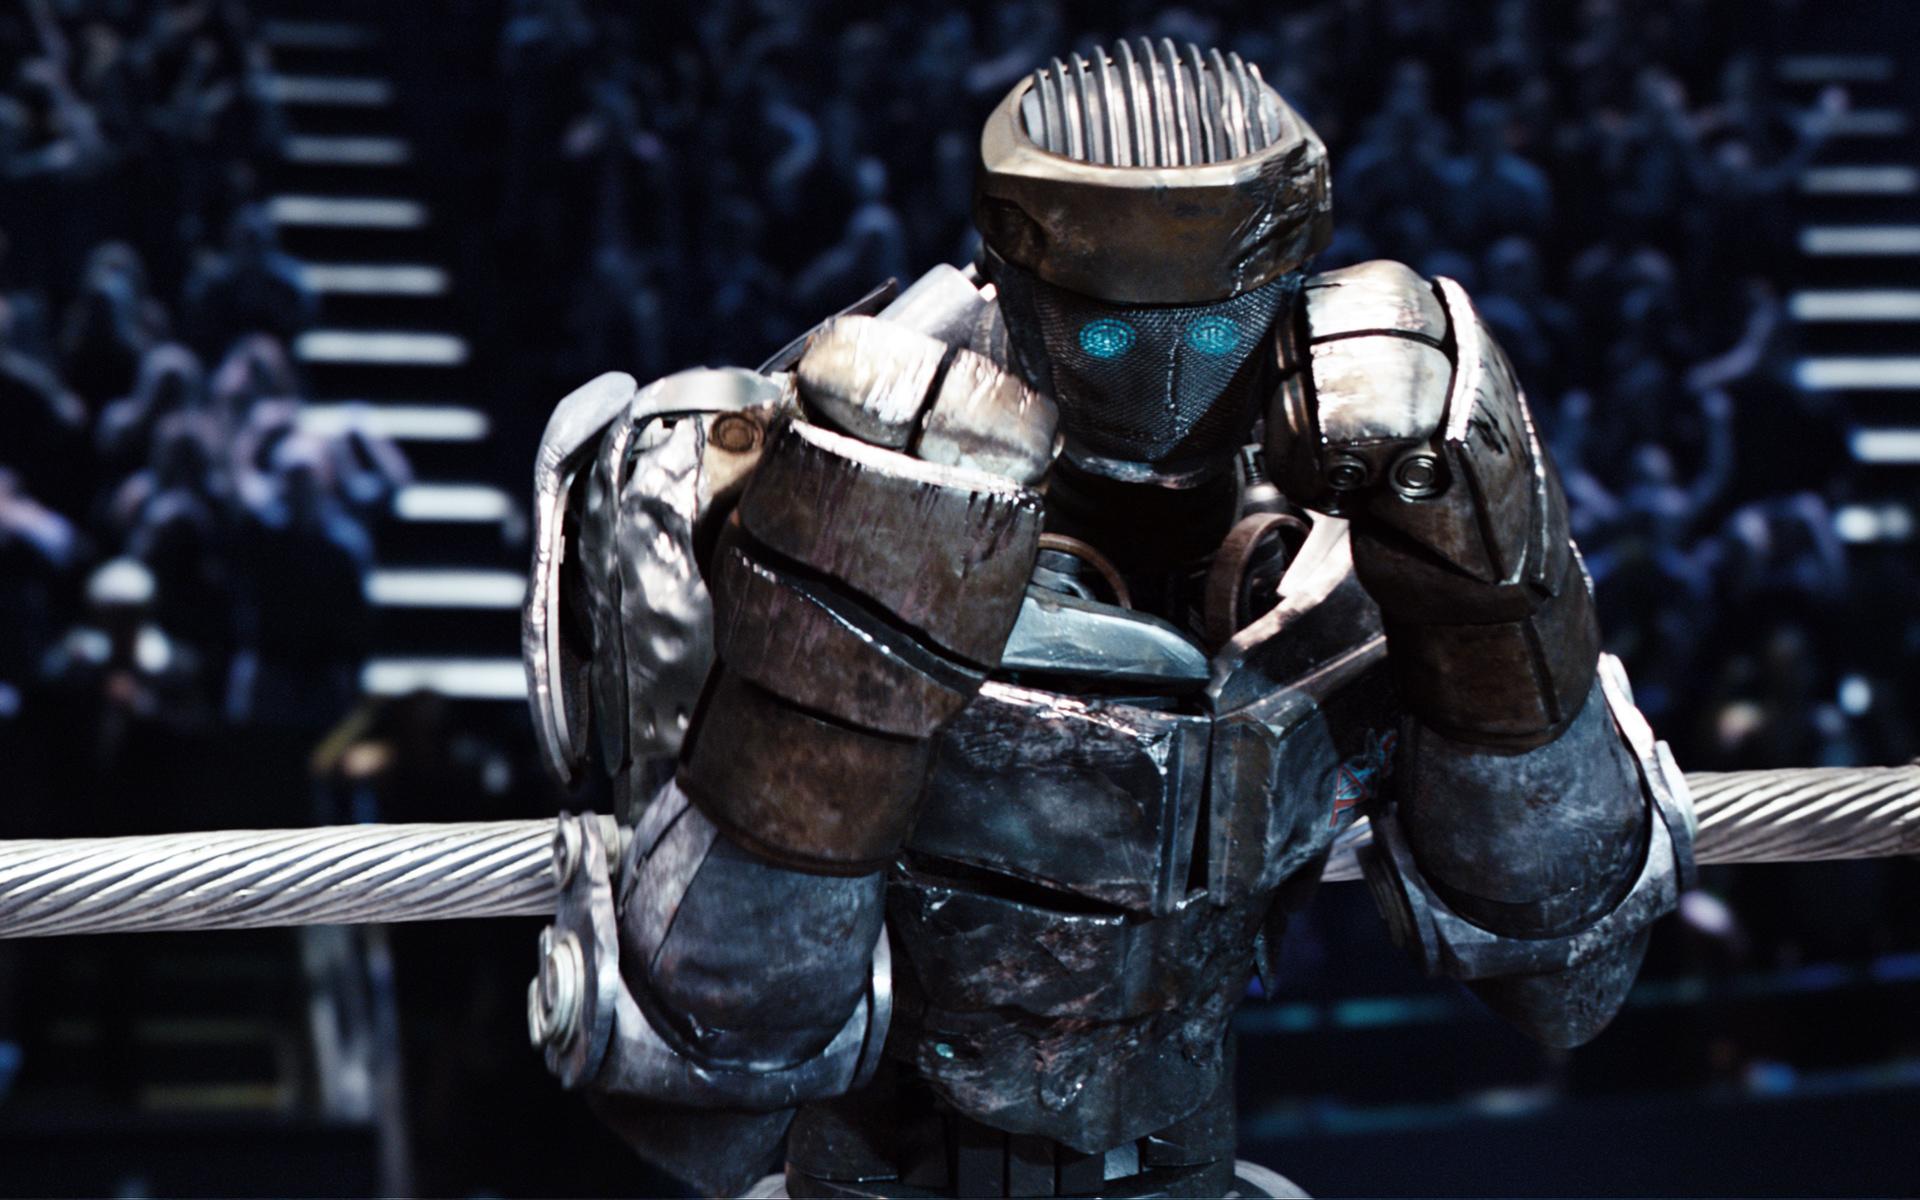 3 Badass of the Most Badass Robots on Film